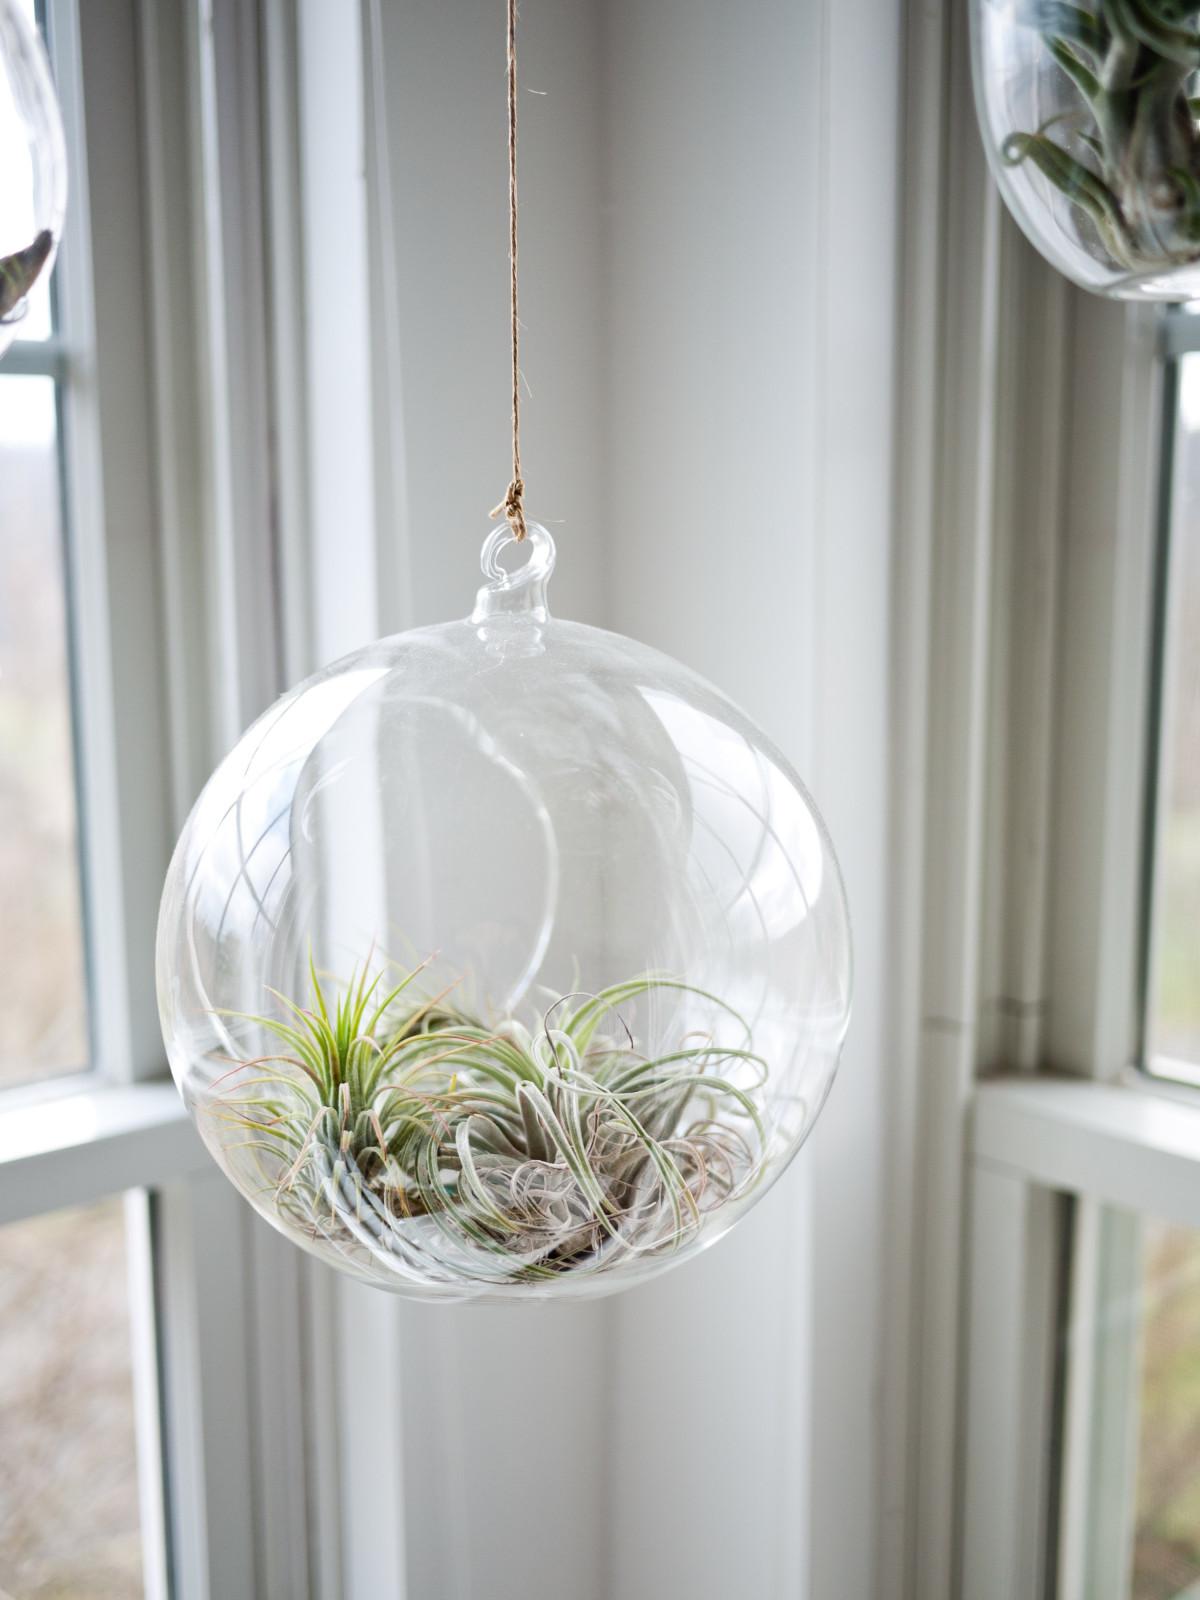 plant, glass, indoor, hanging, airplant, neutral, lighting, interior design, light fixture, floristry